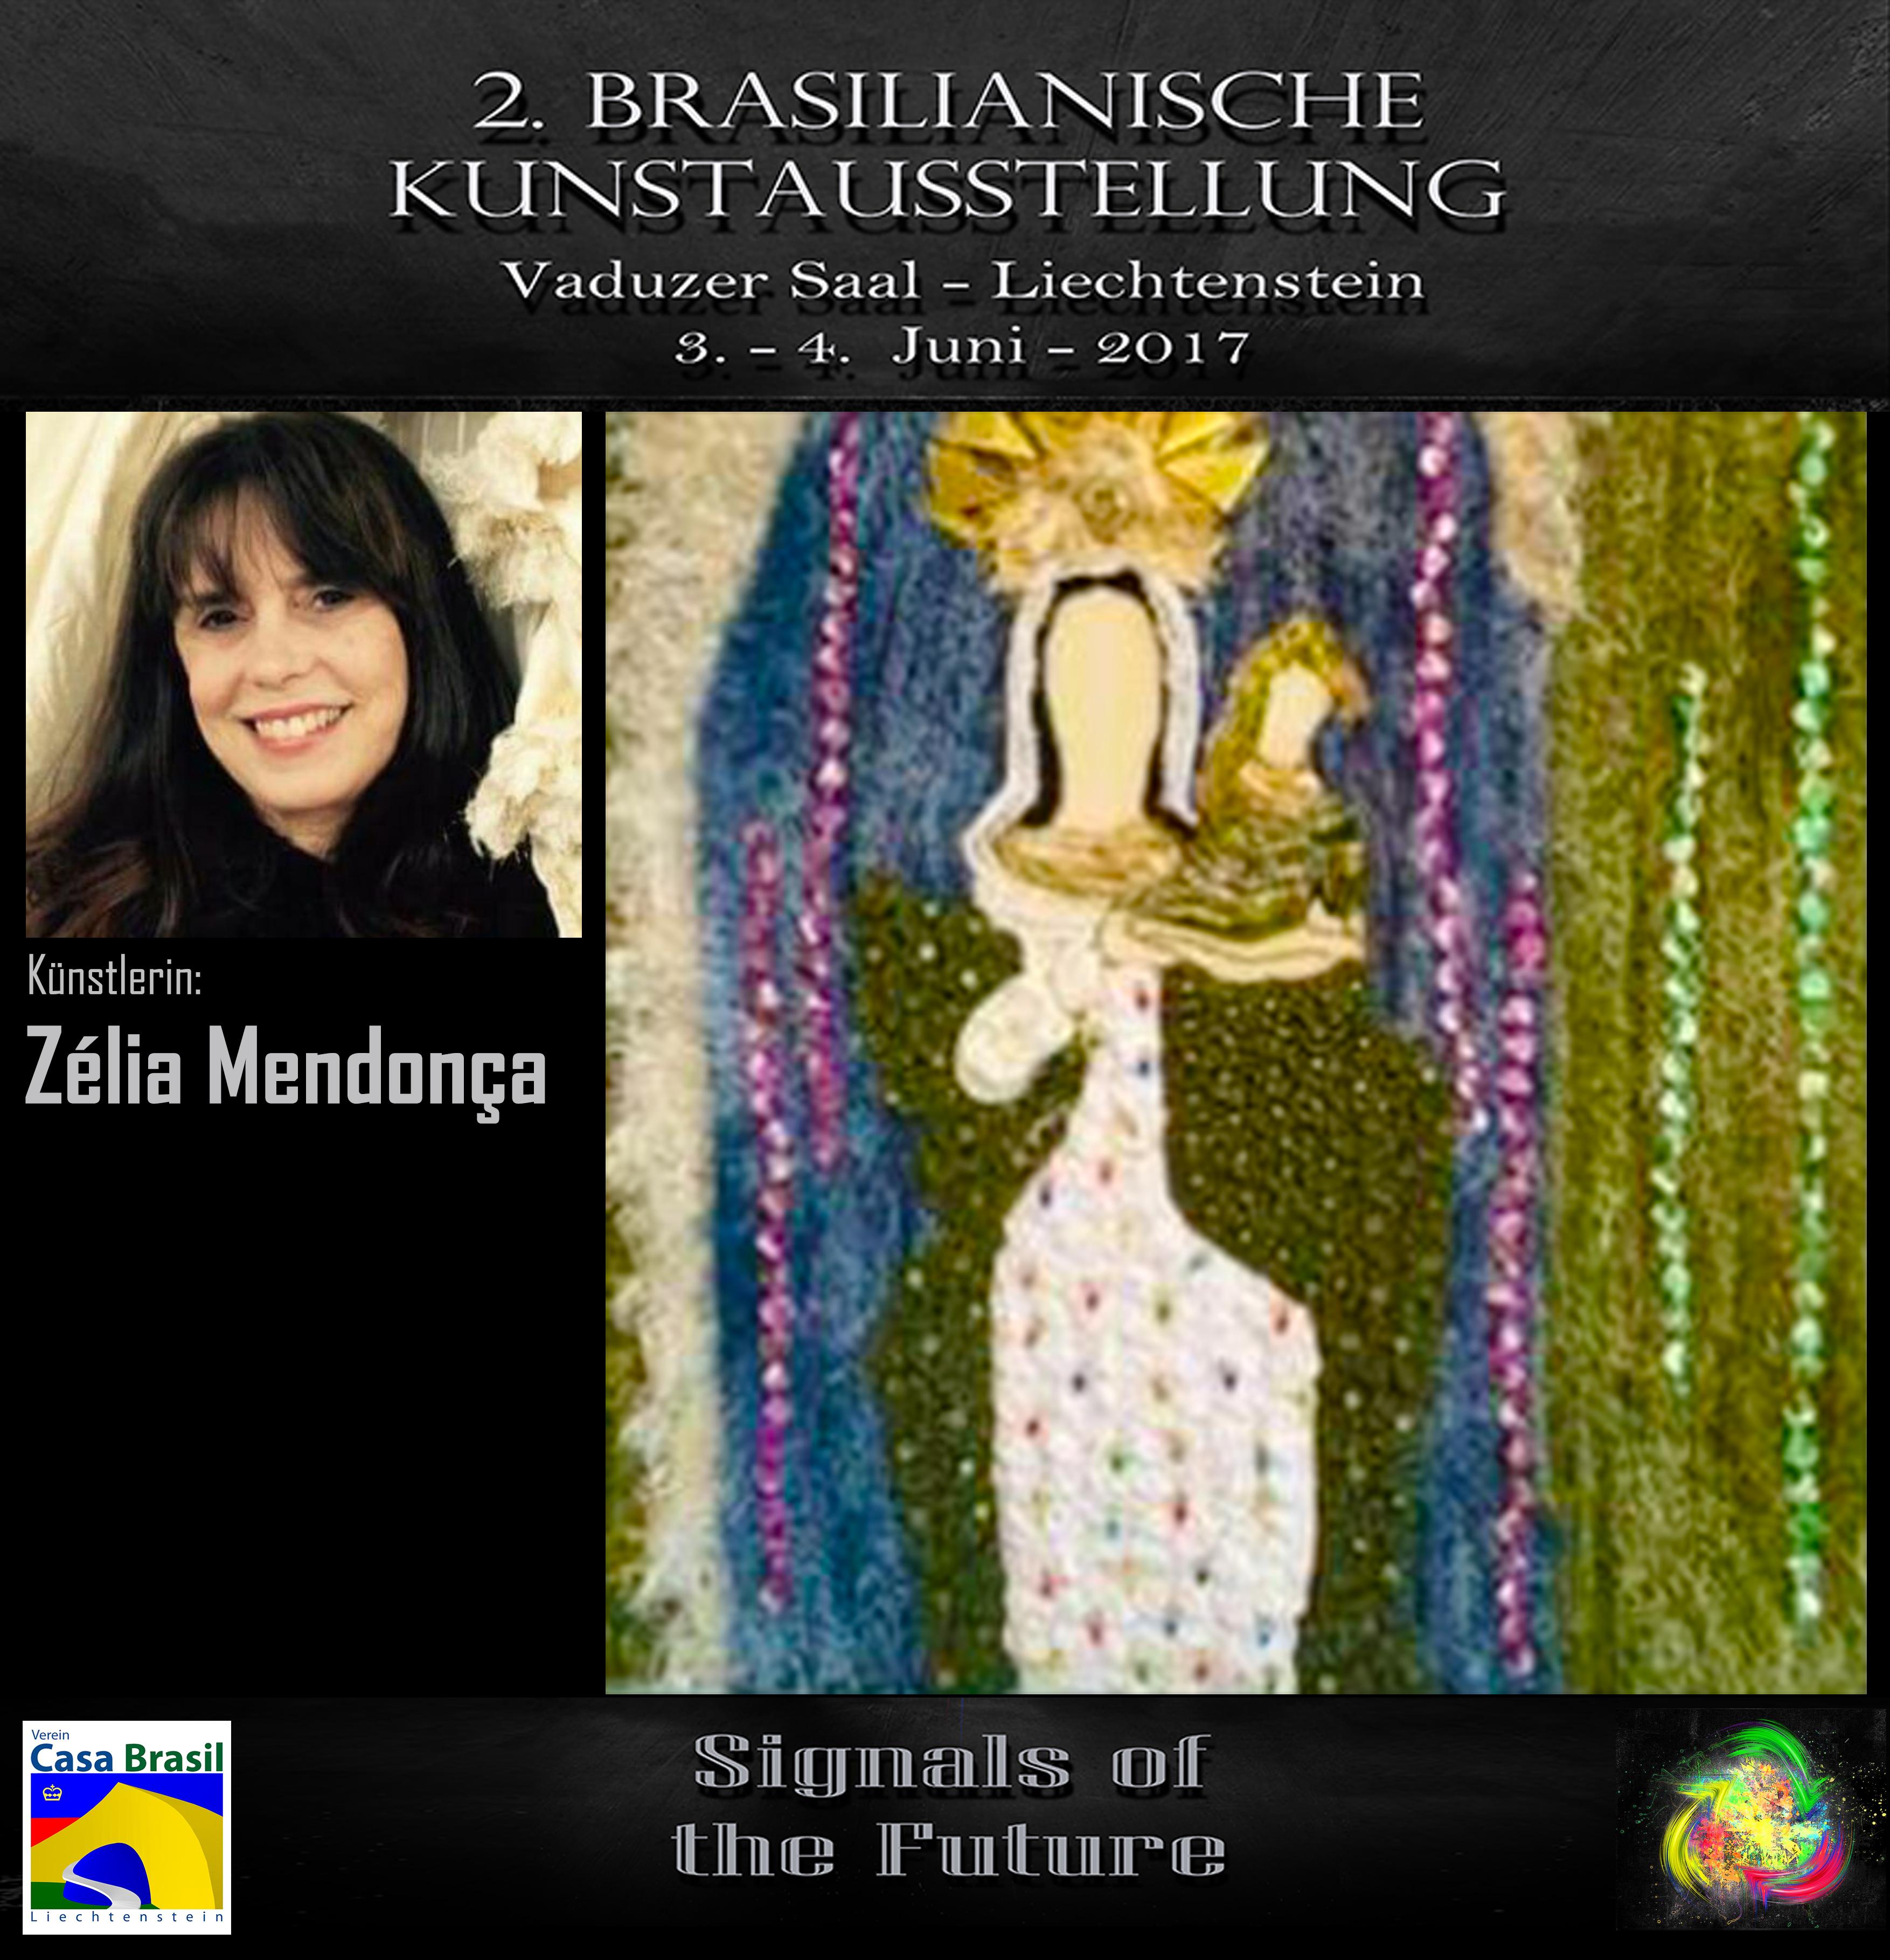 Zélia Mendonça